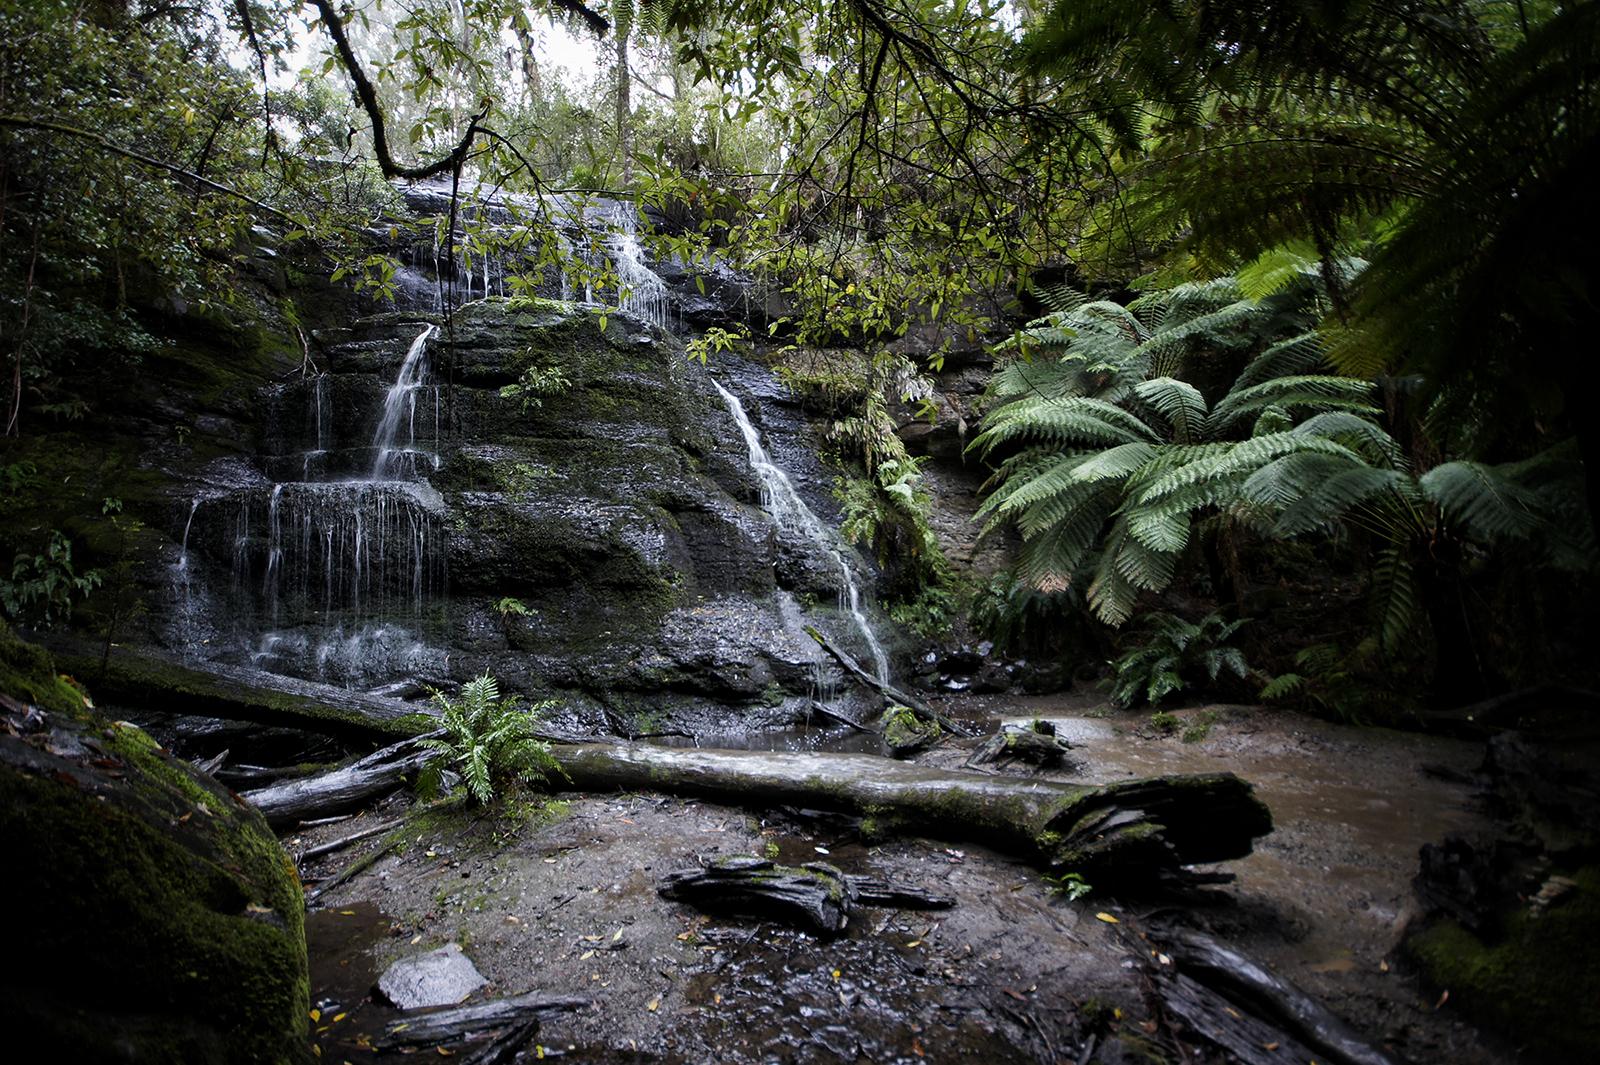 Kieran Rae Otway Rainforest Jungle Waterfall Henderson Falls Victoria Australia